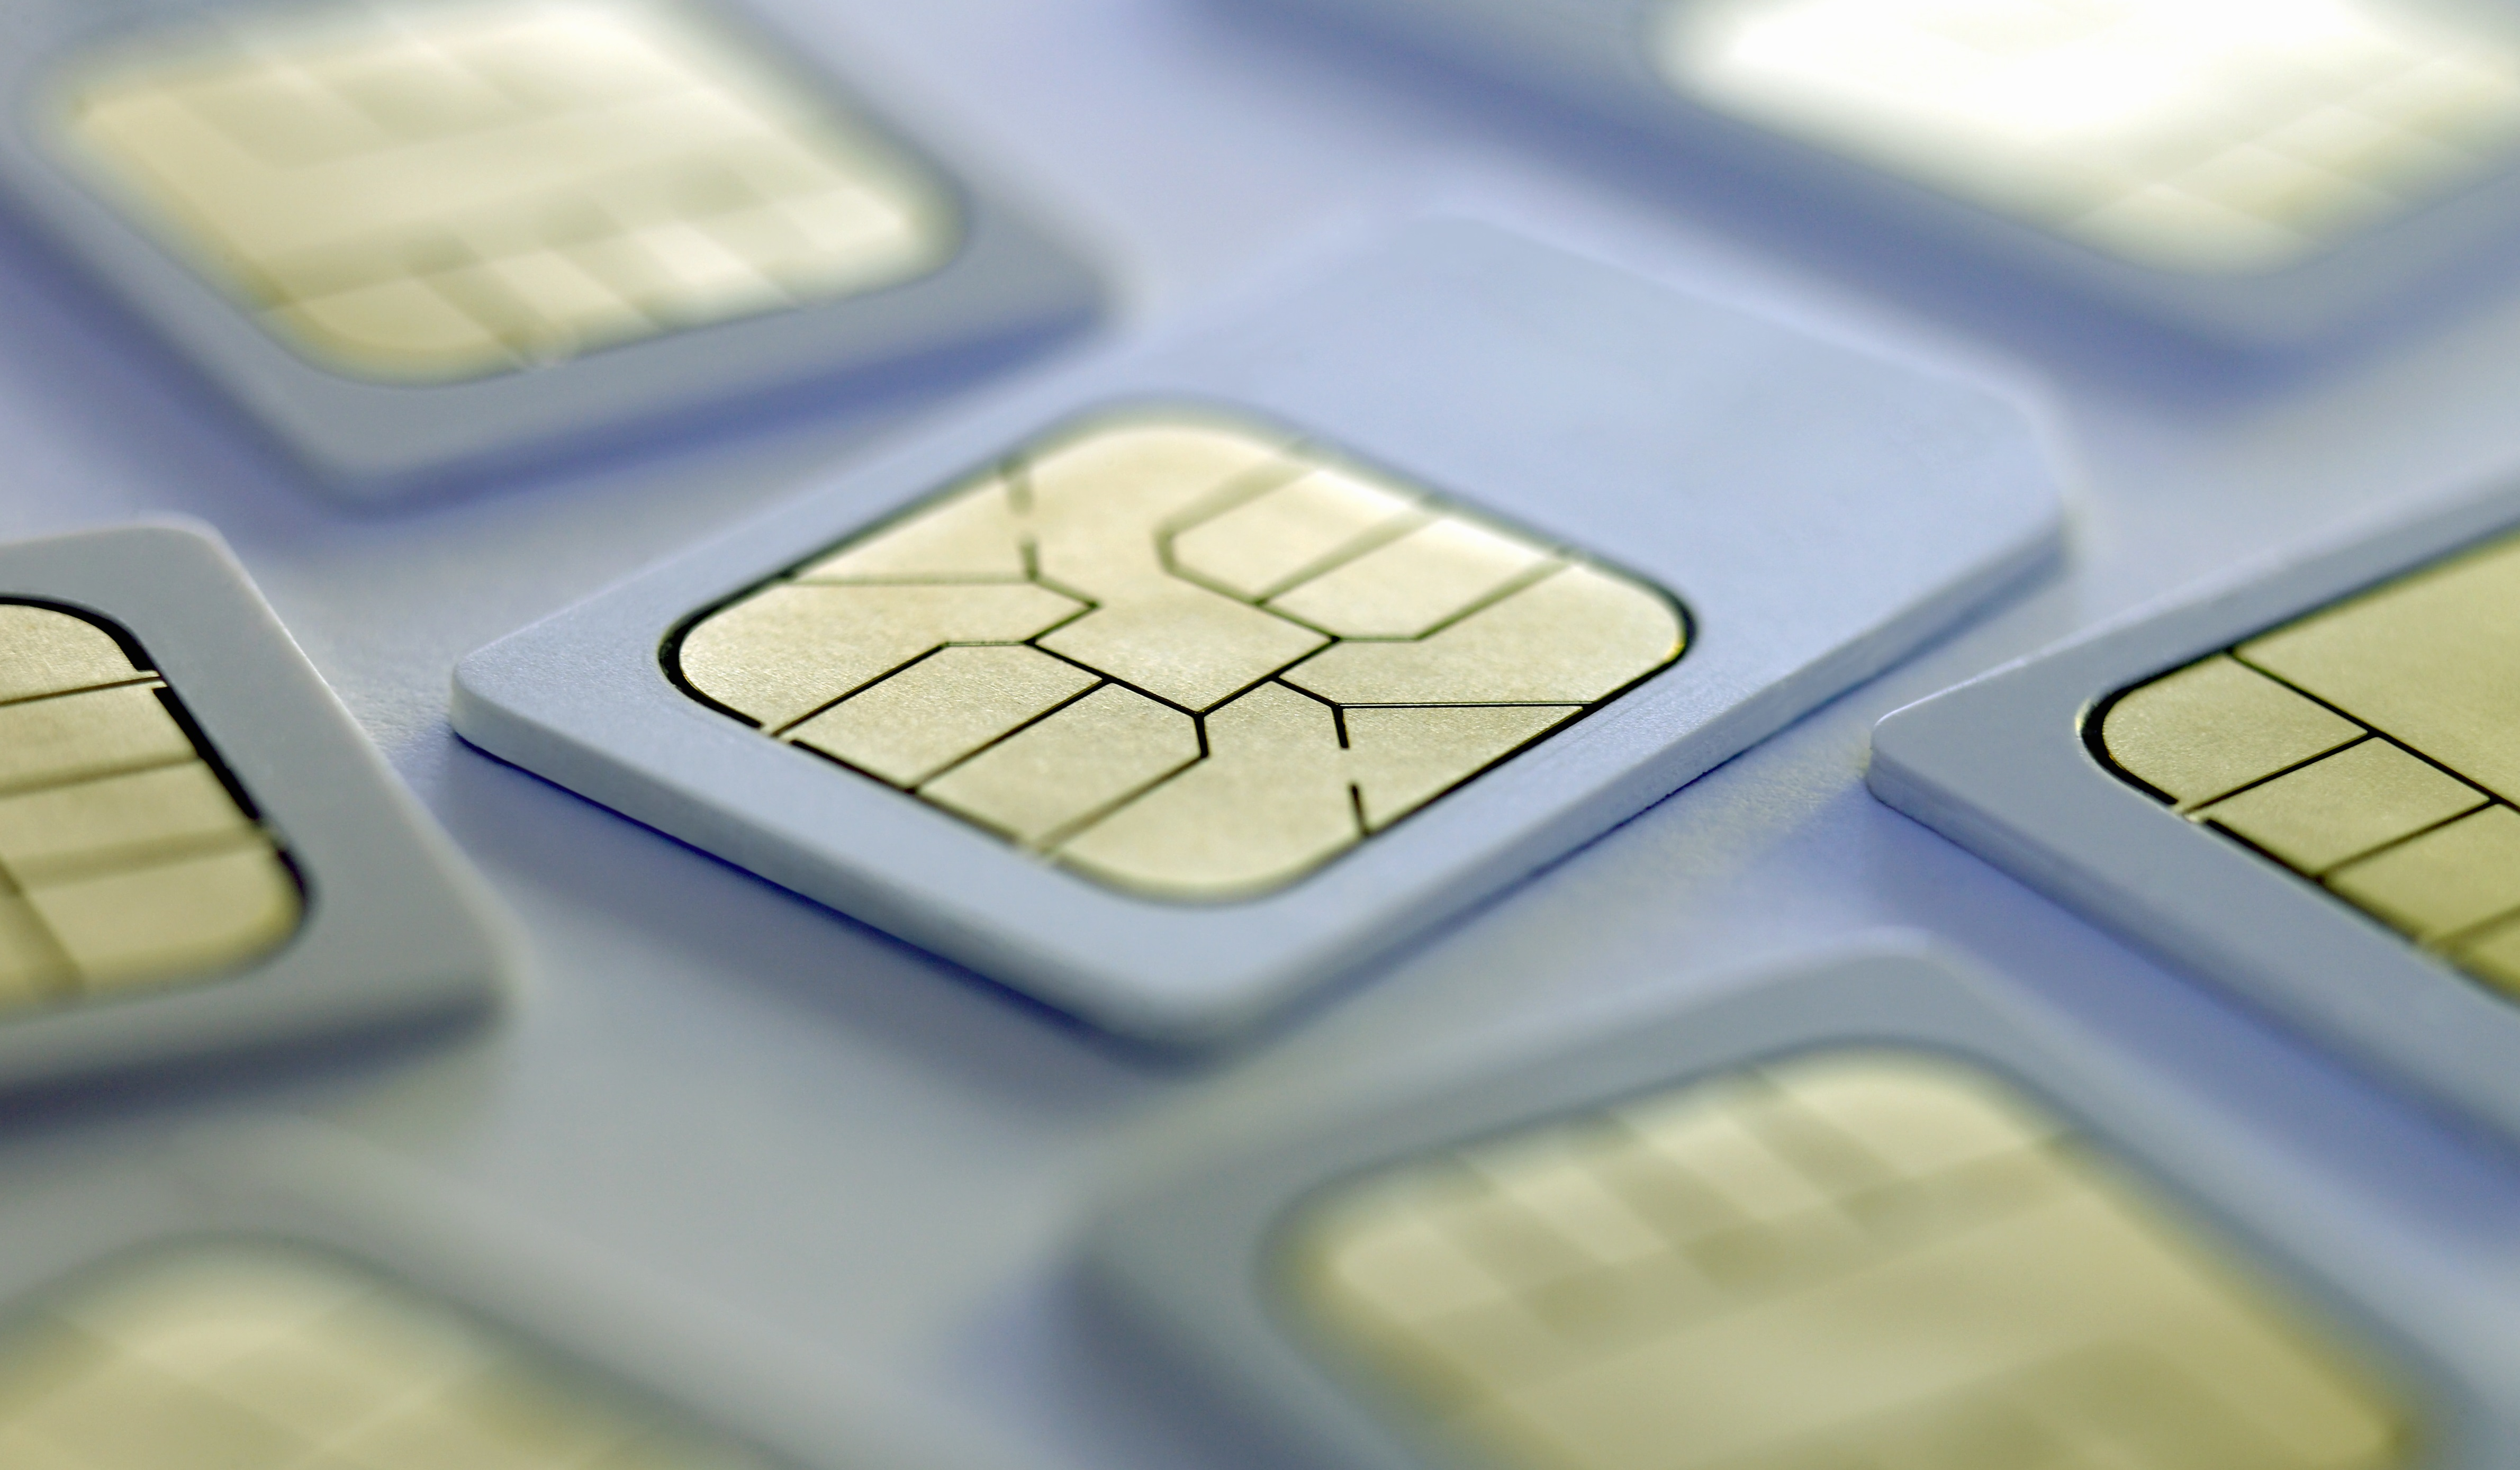 How SIM Card works?